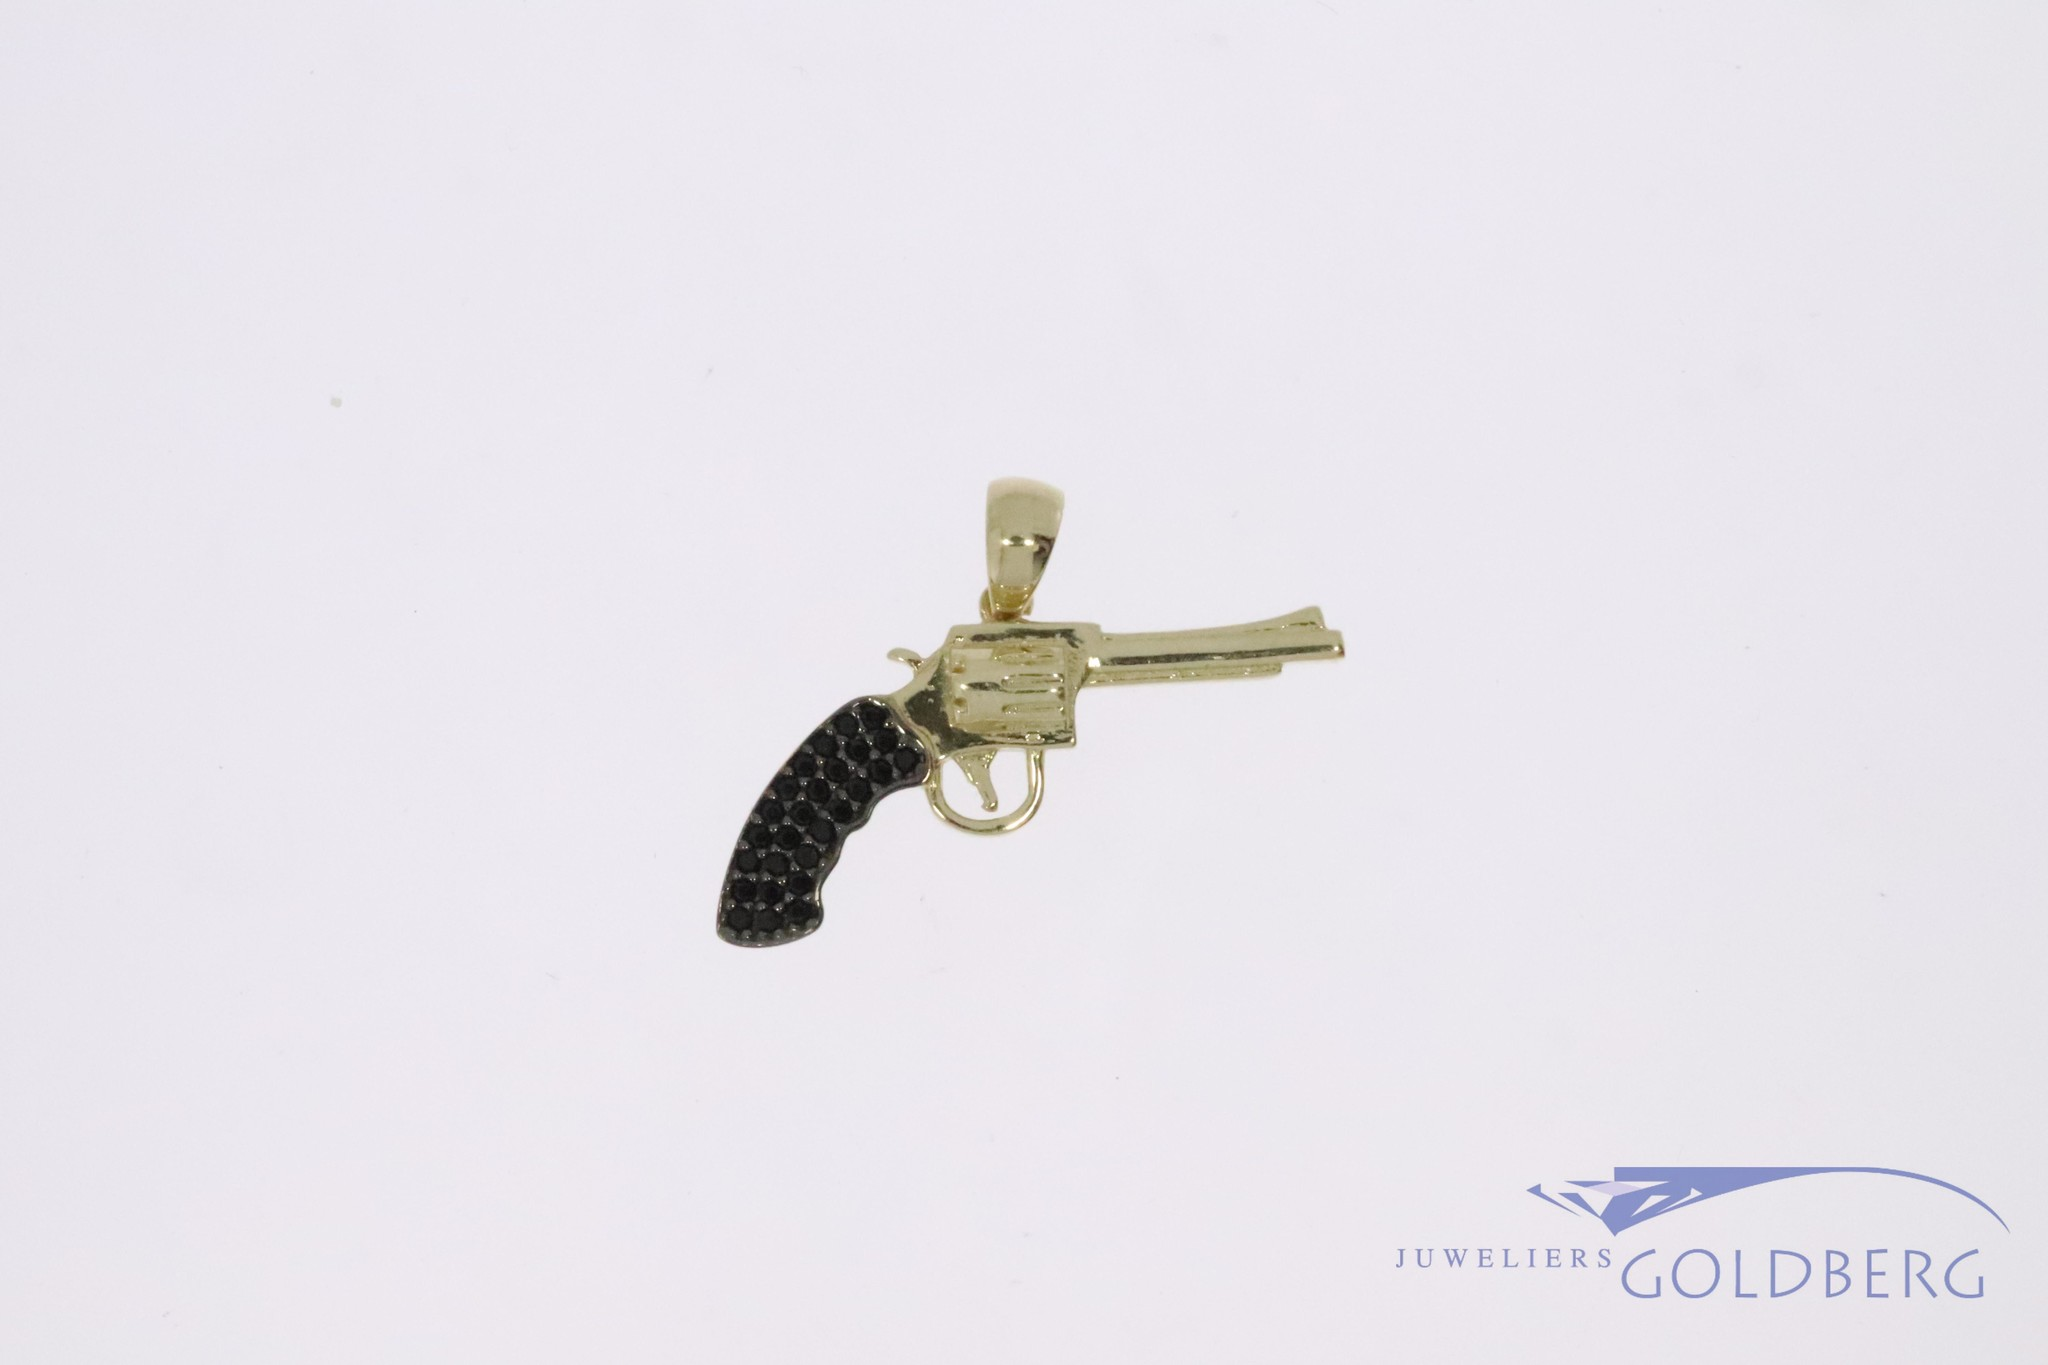 14k gold small revolver pendant with black zirconia's